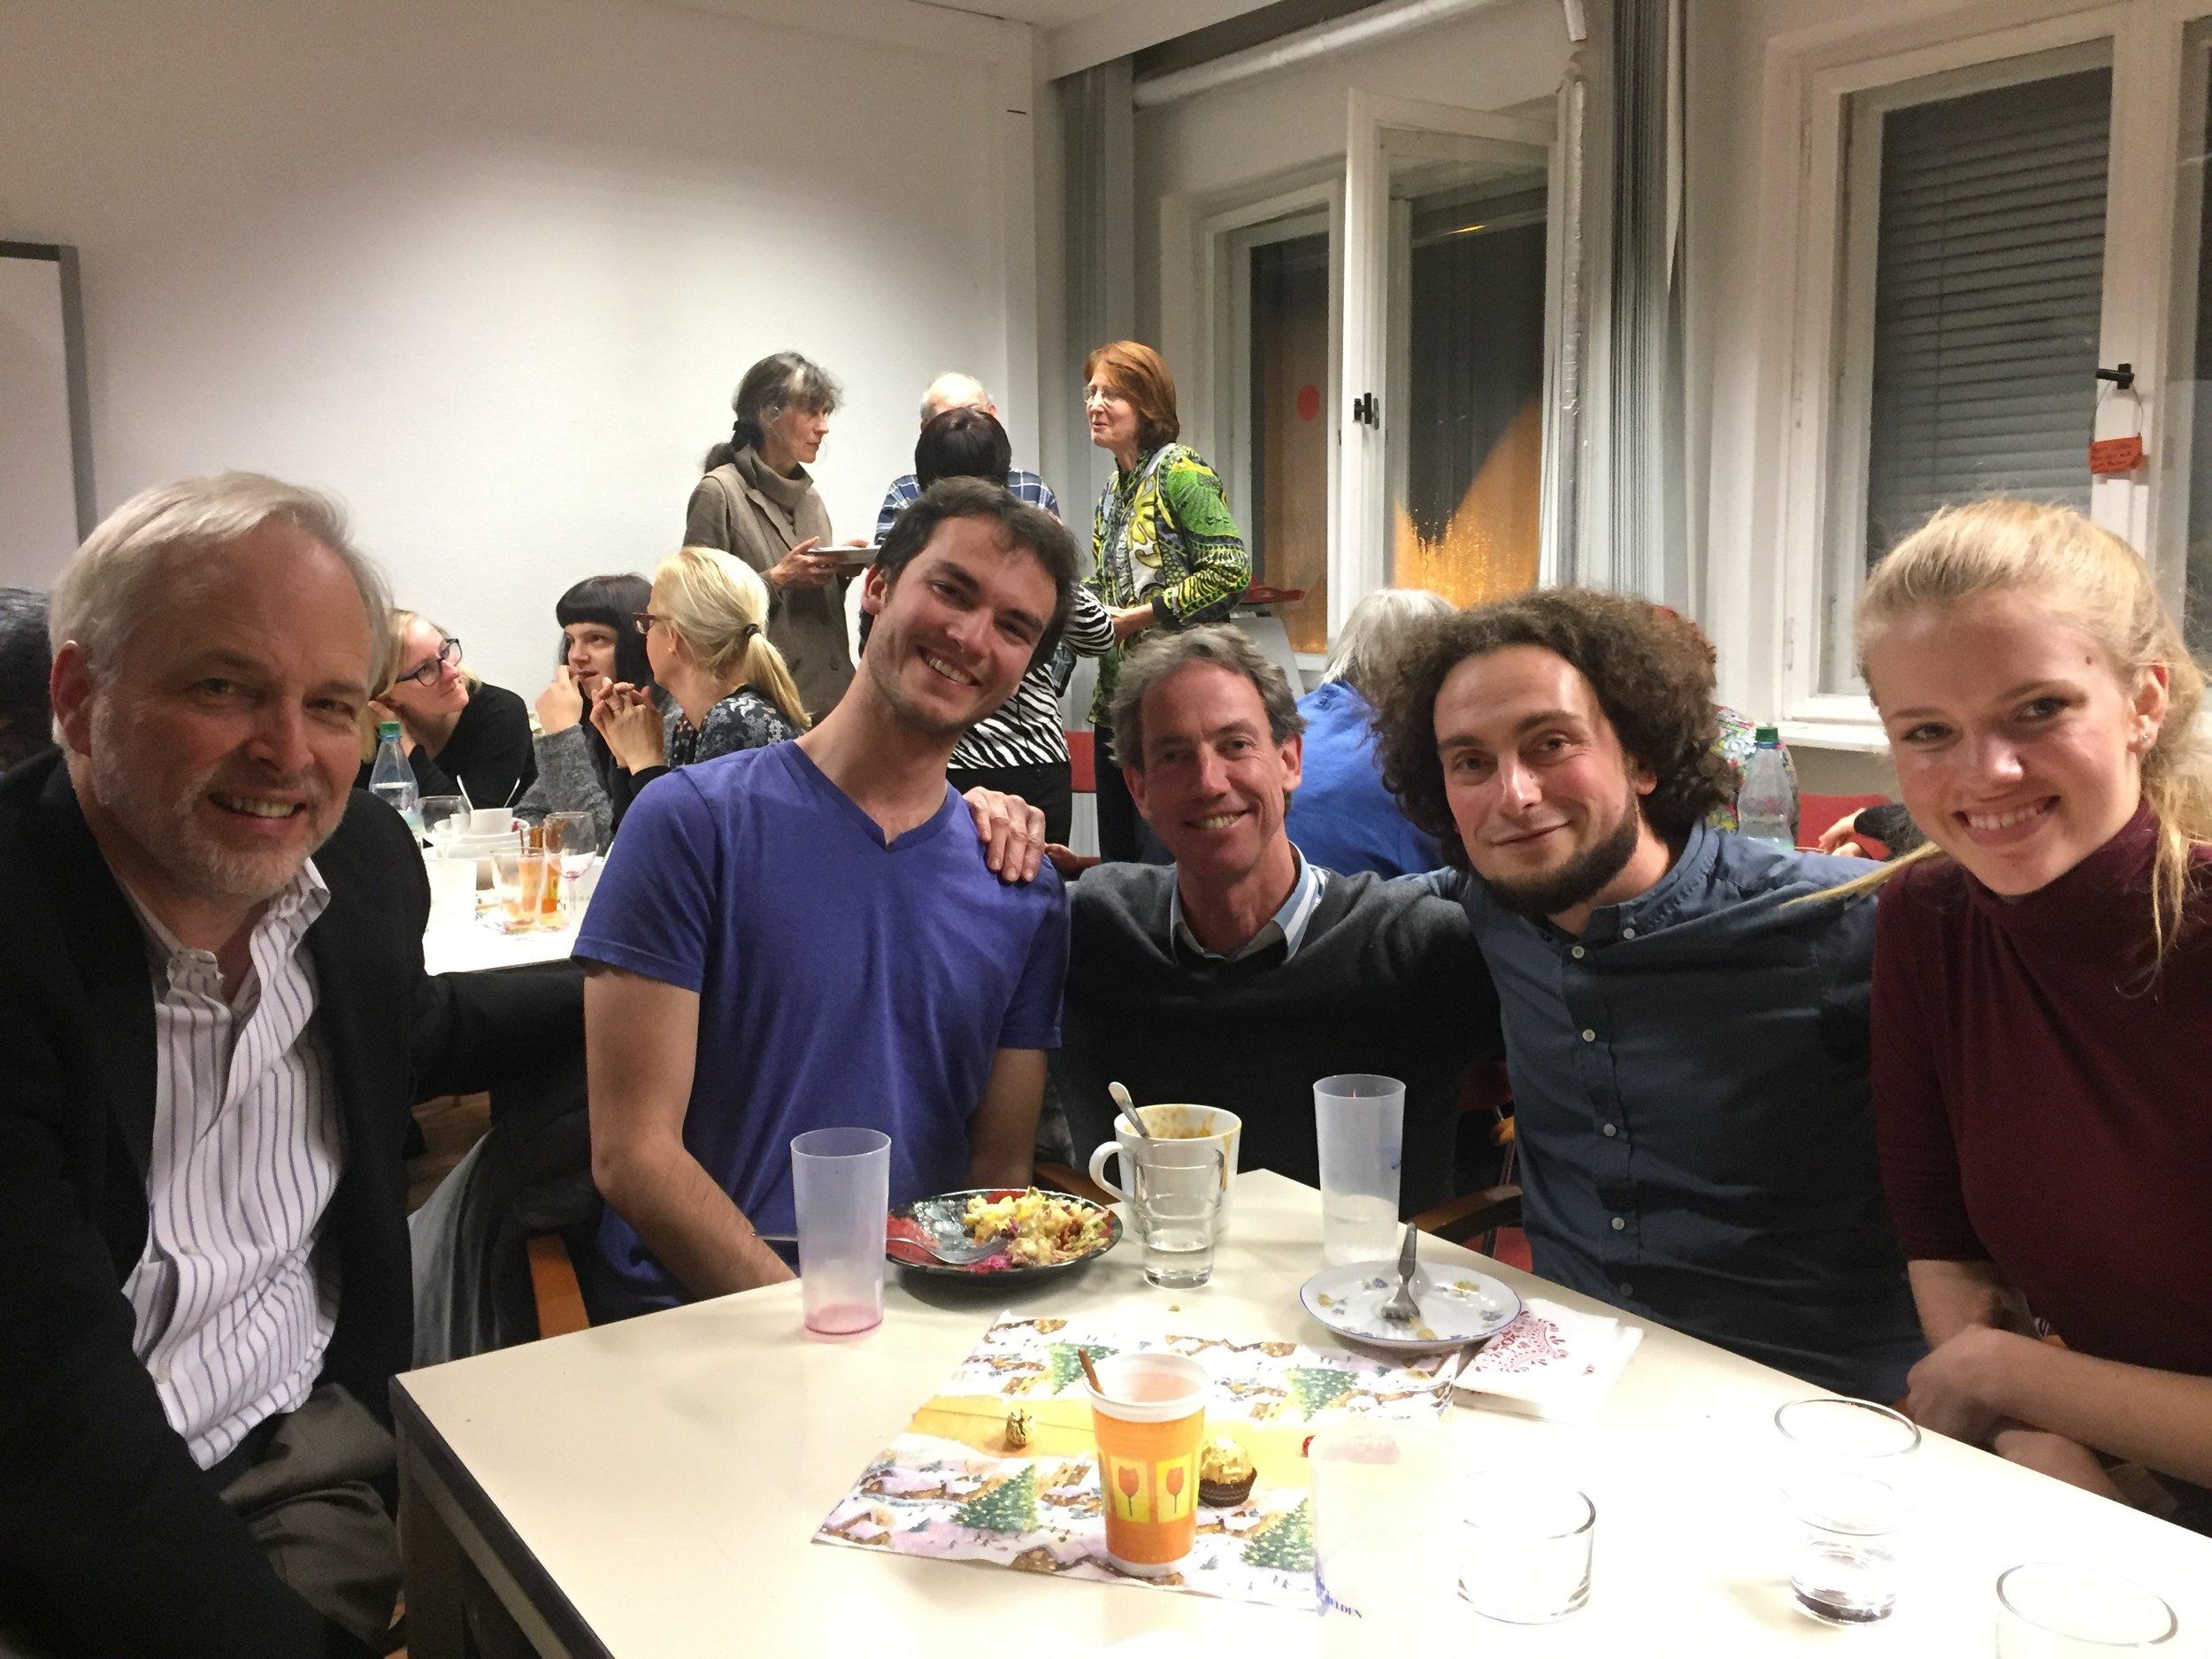 Tom Lloyd, Tom Sternberg HC'17,Jan Dahlgrün (visit organizer for Int. Chor), Eugen Zigutkin (conductor for Int. Chor), Anna Swartzentruber BMC'18